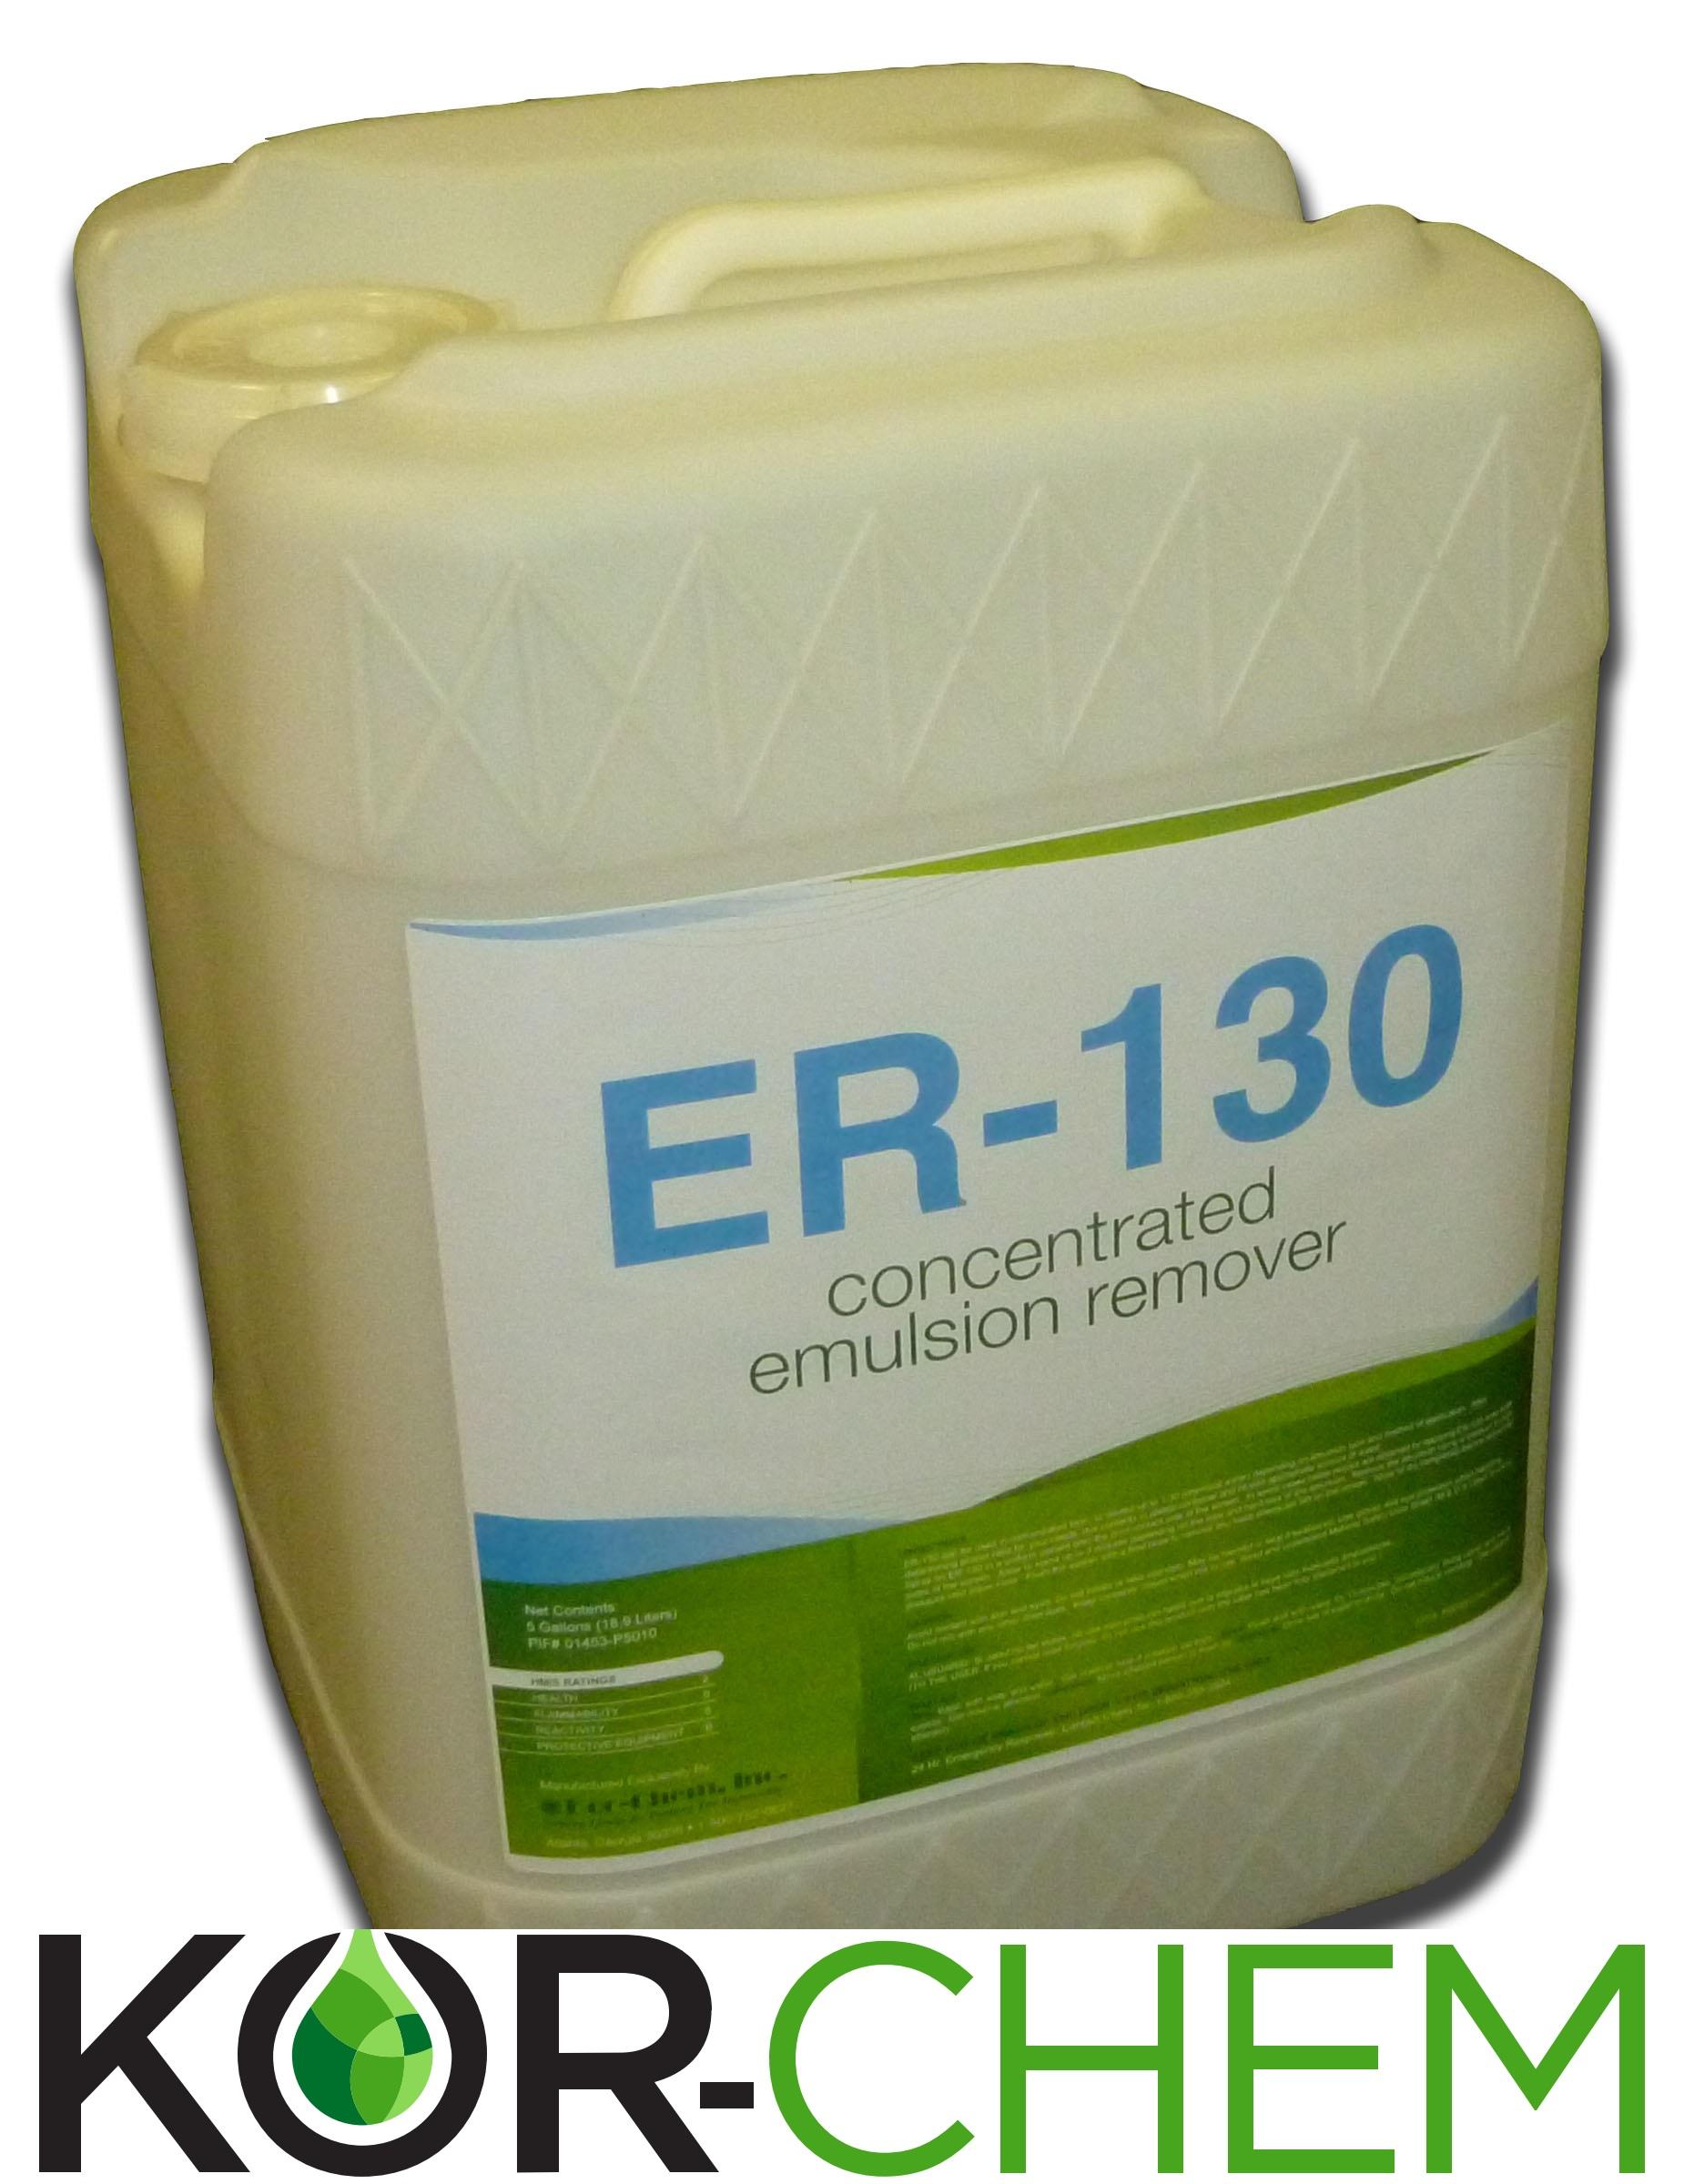 Emulsion Remover